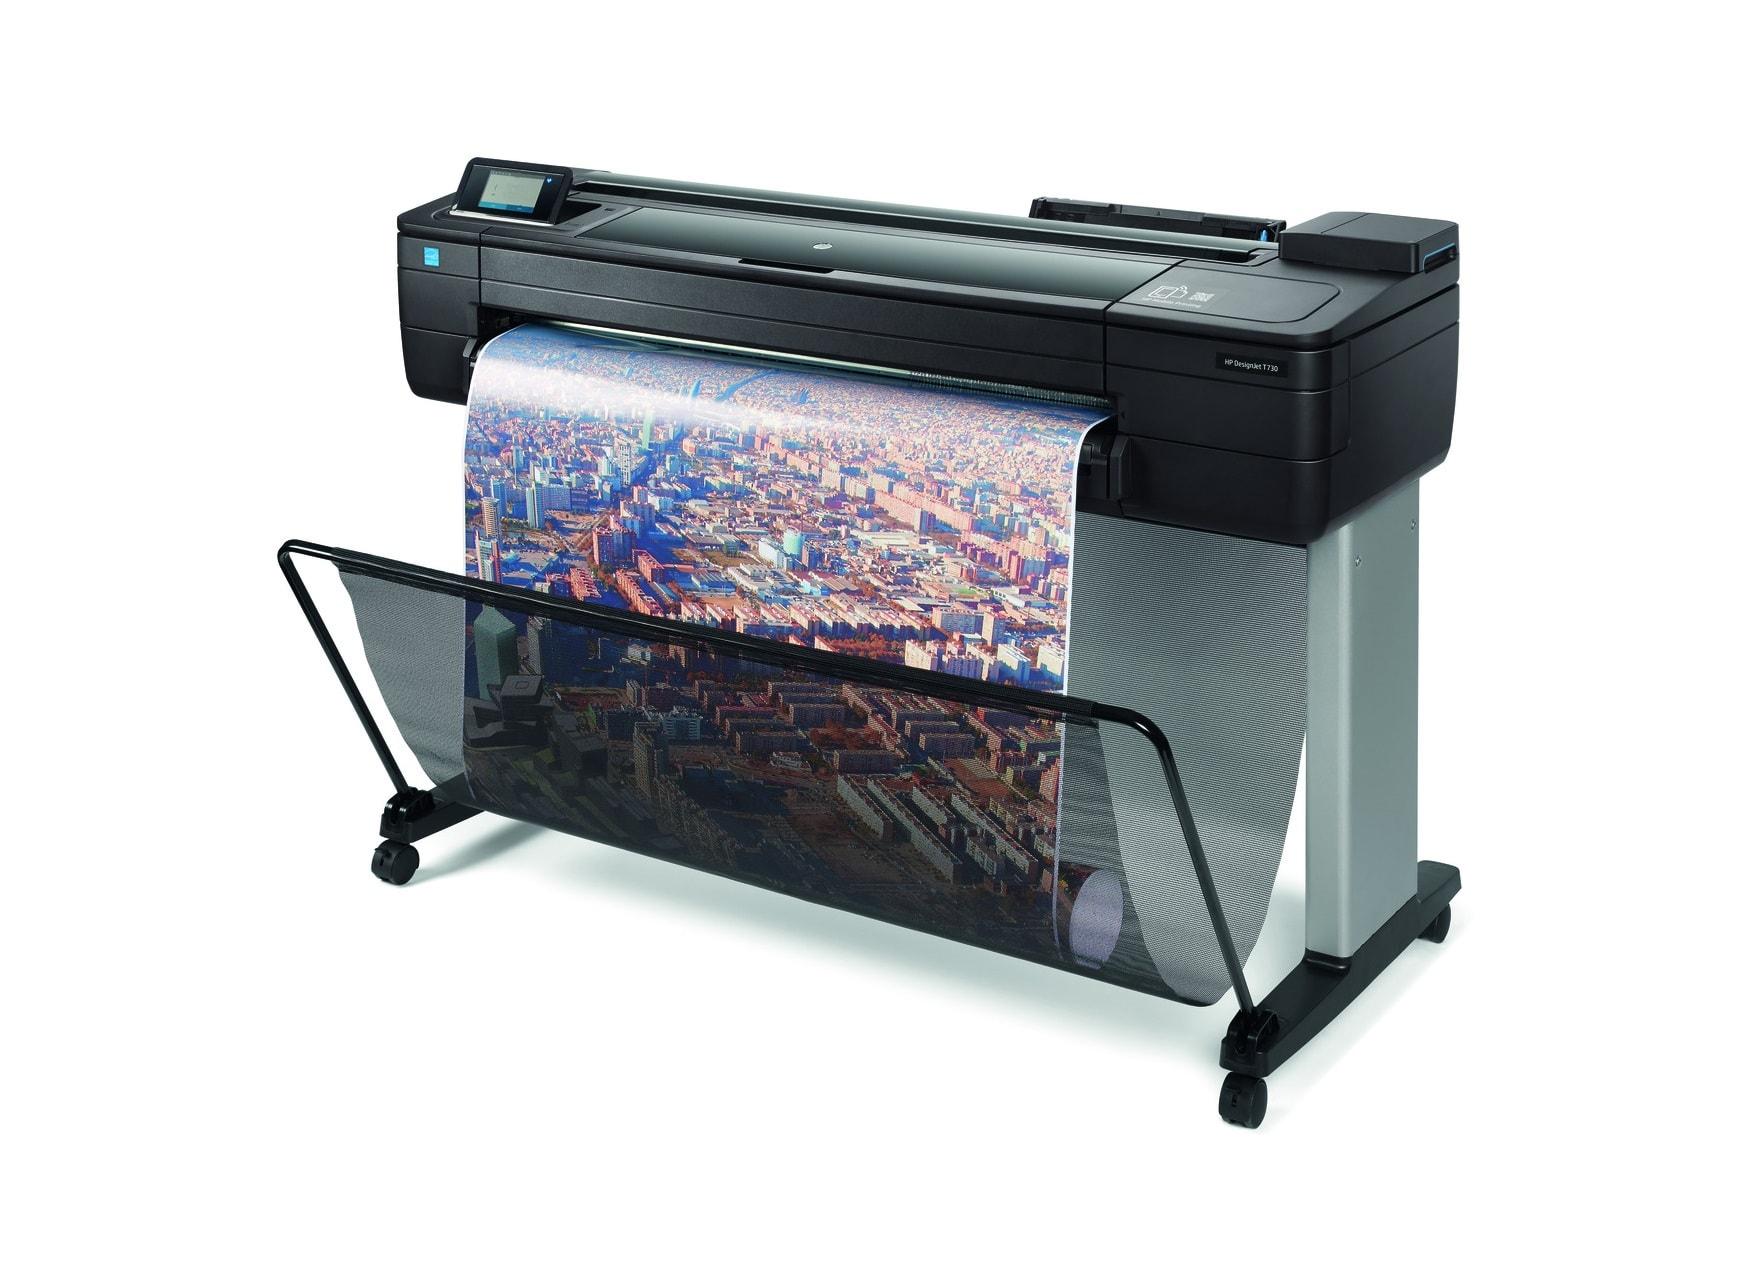 "Imprimante HP DesignJet T730 36"" - Cybertek.fr - 3"